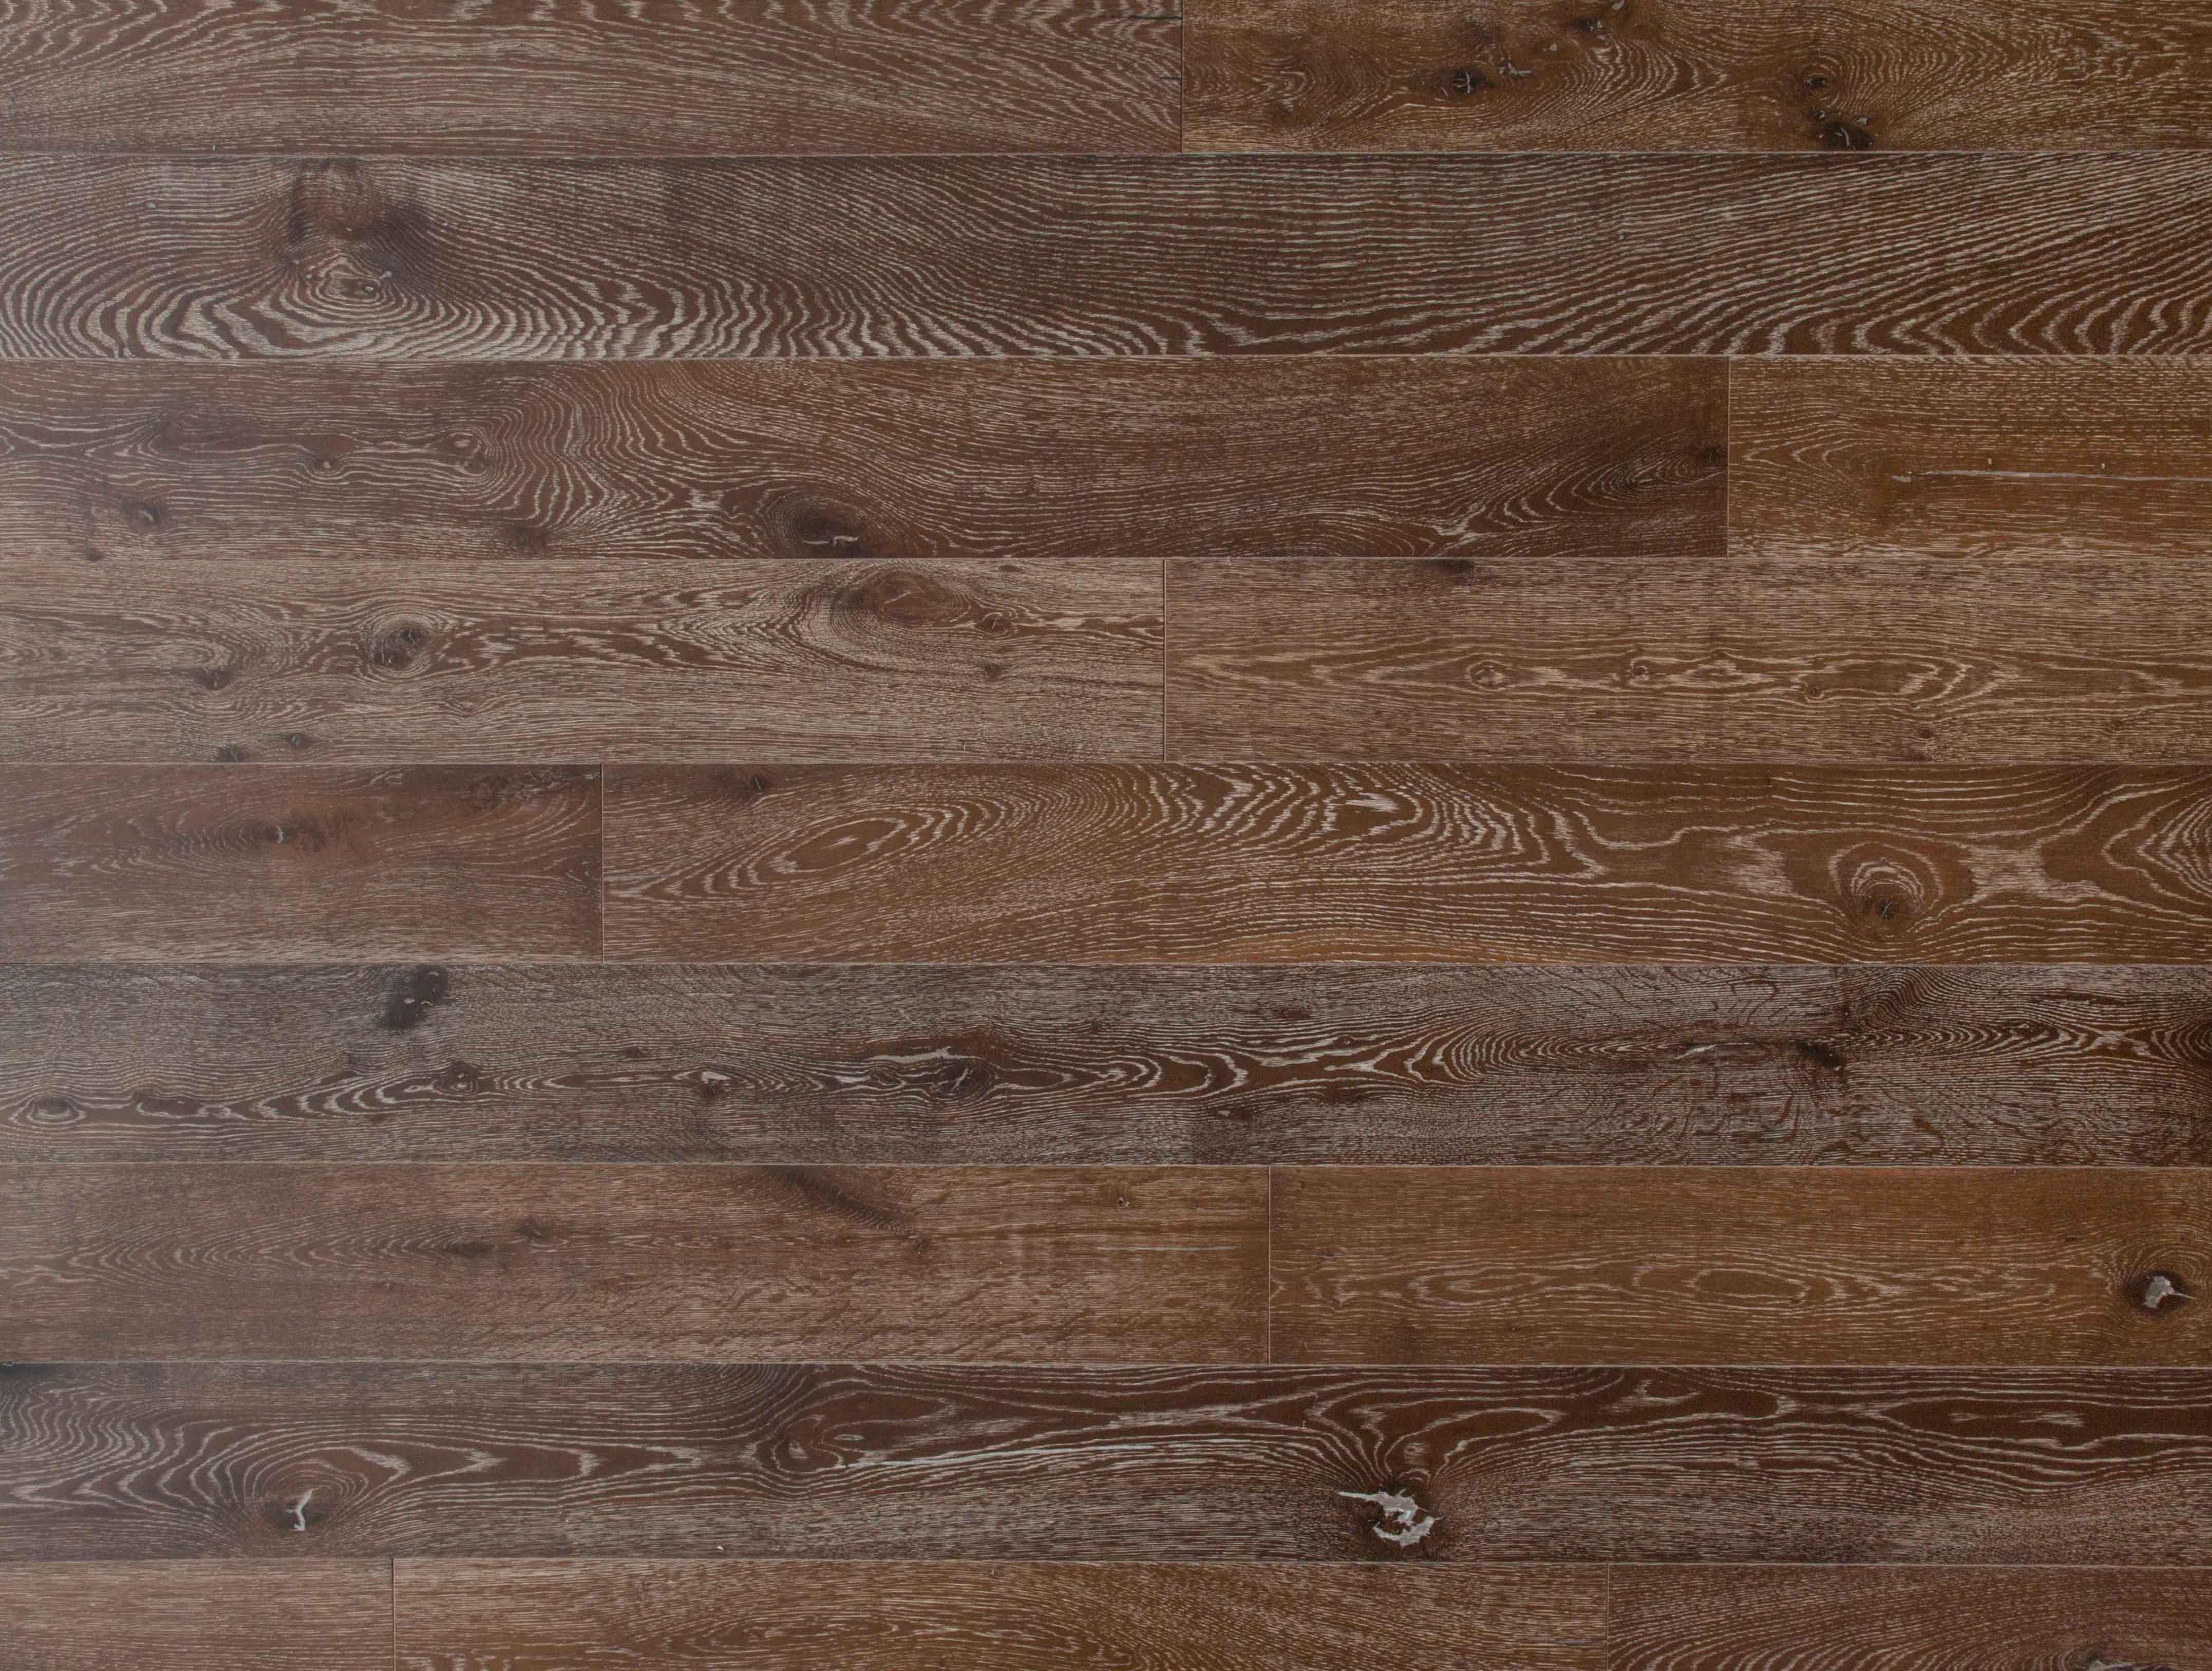 wood floors line_weight prado POTCERZ